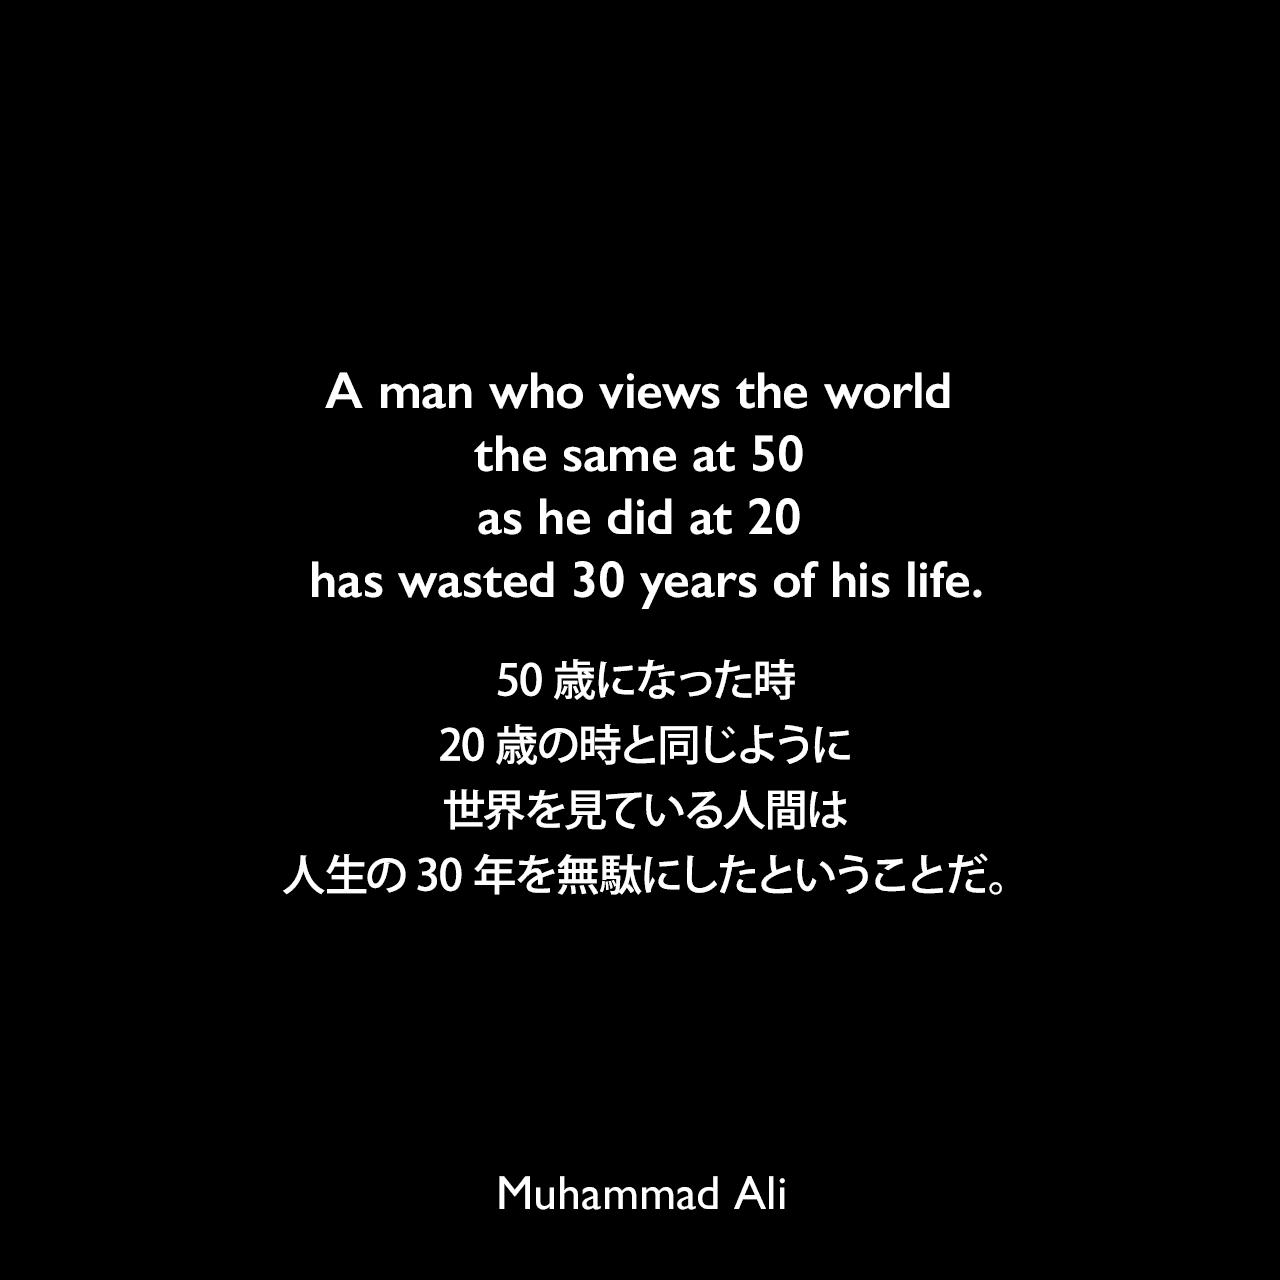 A man who views the world the same at 50 as he did at 20 has wasted 30 years of his life.50歳になった時、20歳の時と同じように世界を見ている人間は、人生の30年を無駄にしたということだ。- 1975年のプレイボーイマガジン誌でのインタビューよりMuhammad Ali